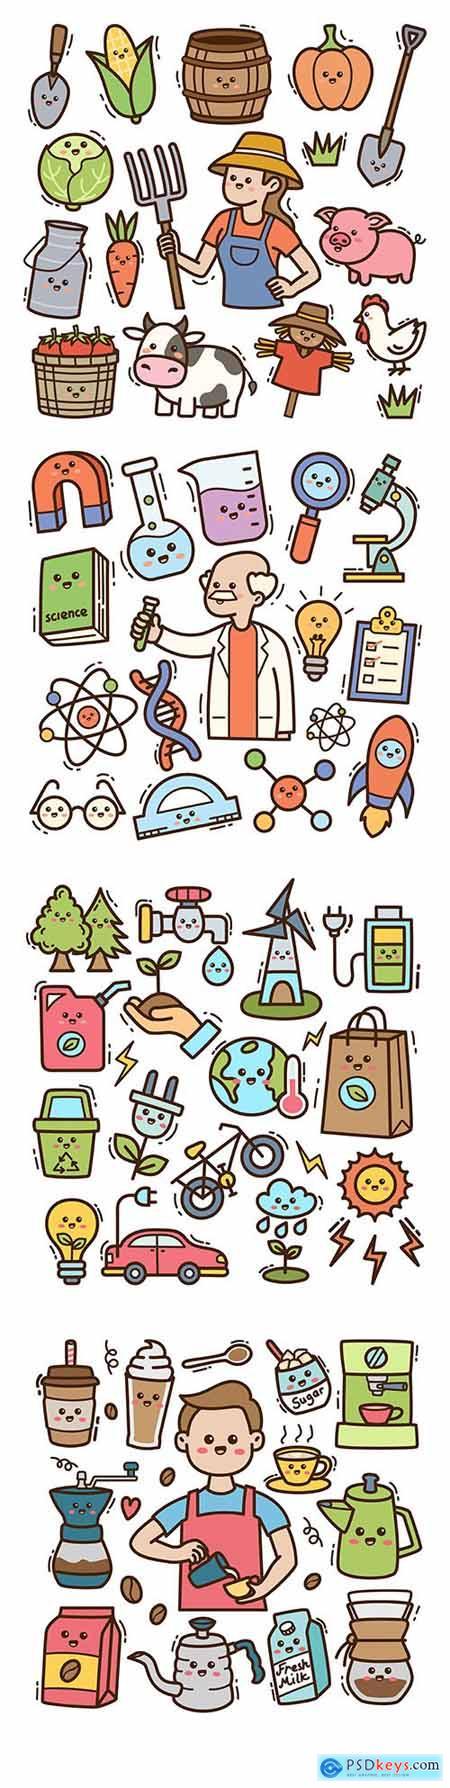 Medicine, ecology and gardening cartoon illustrations